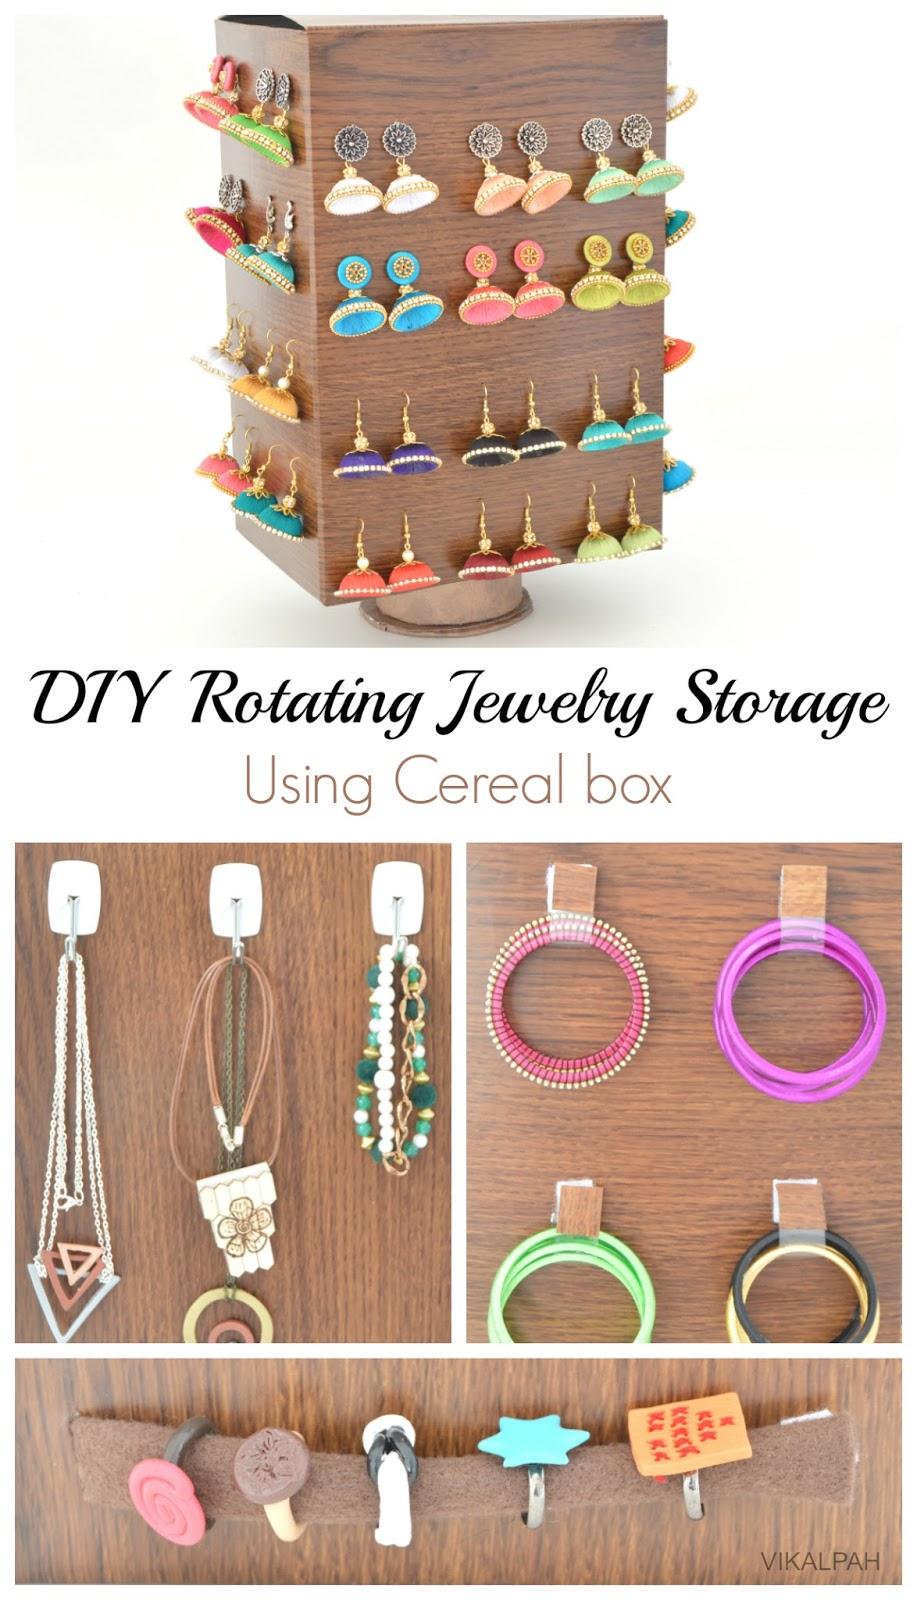 Vikalpah DIY Rotating Jewelry Storage using Cereal box